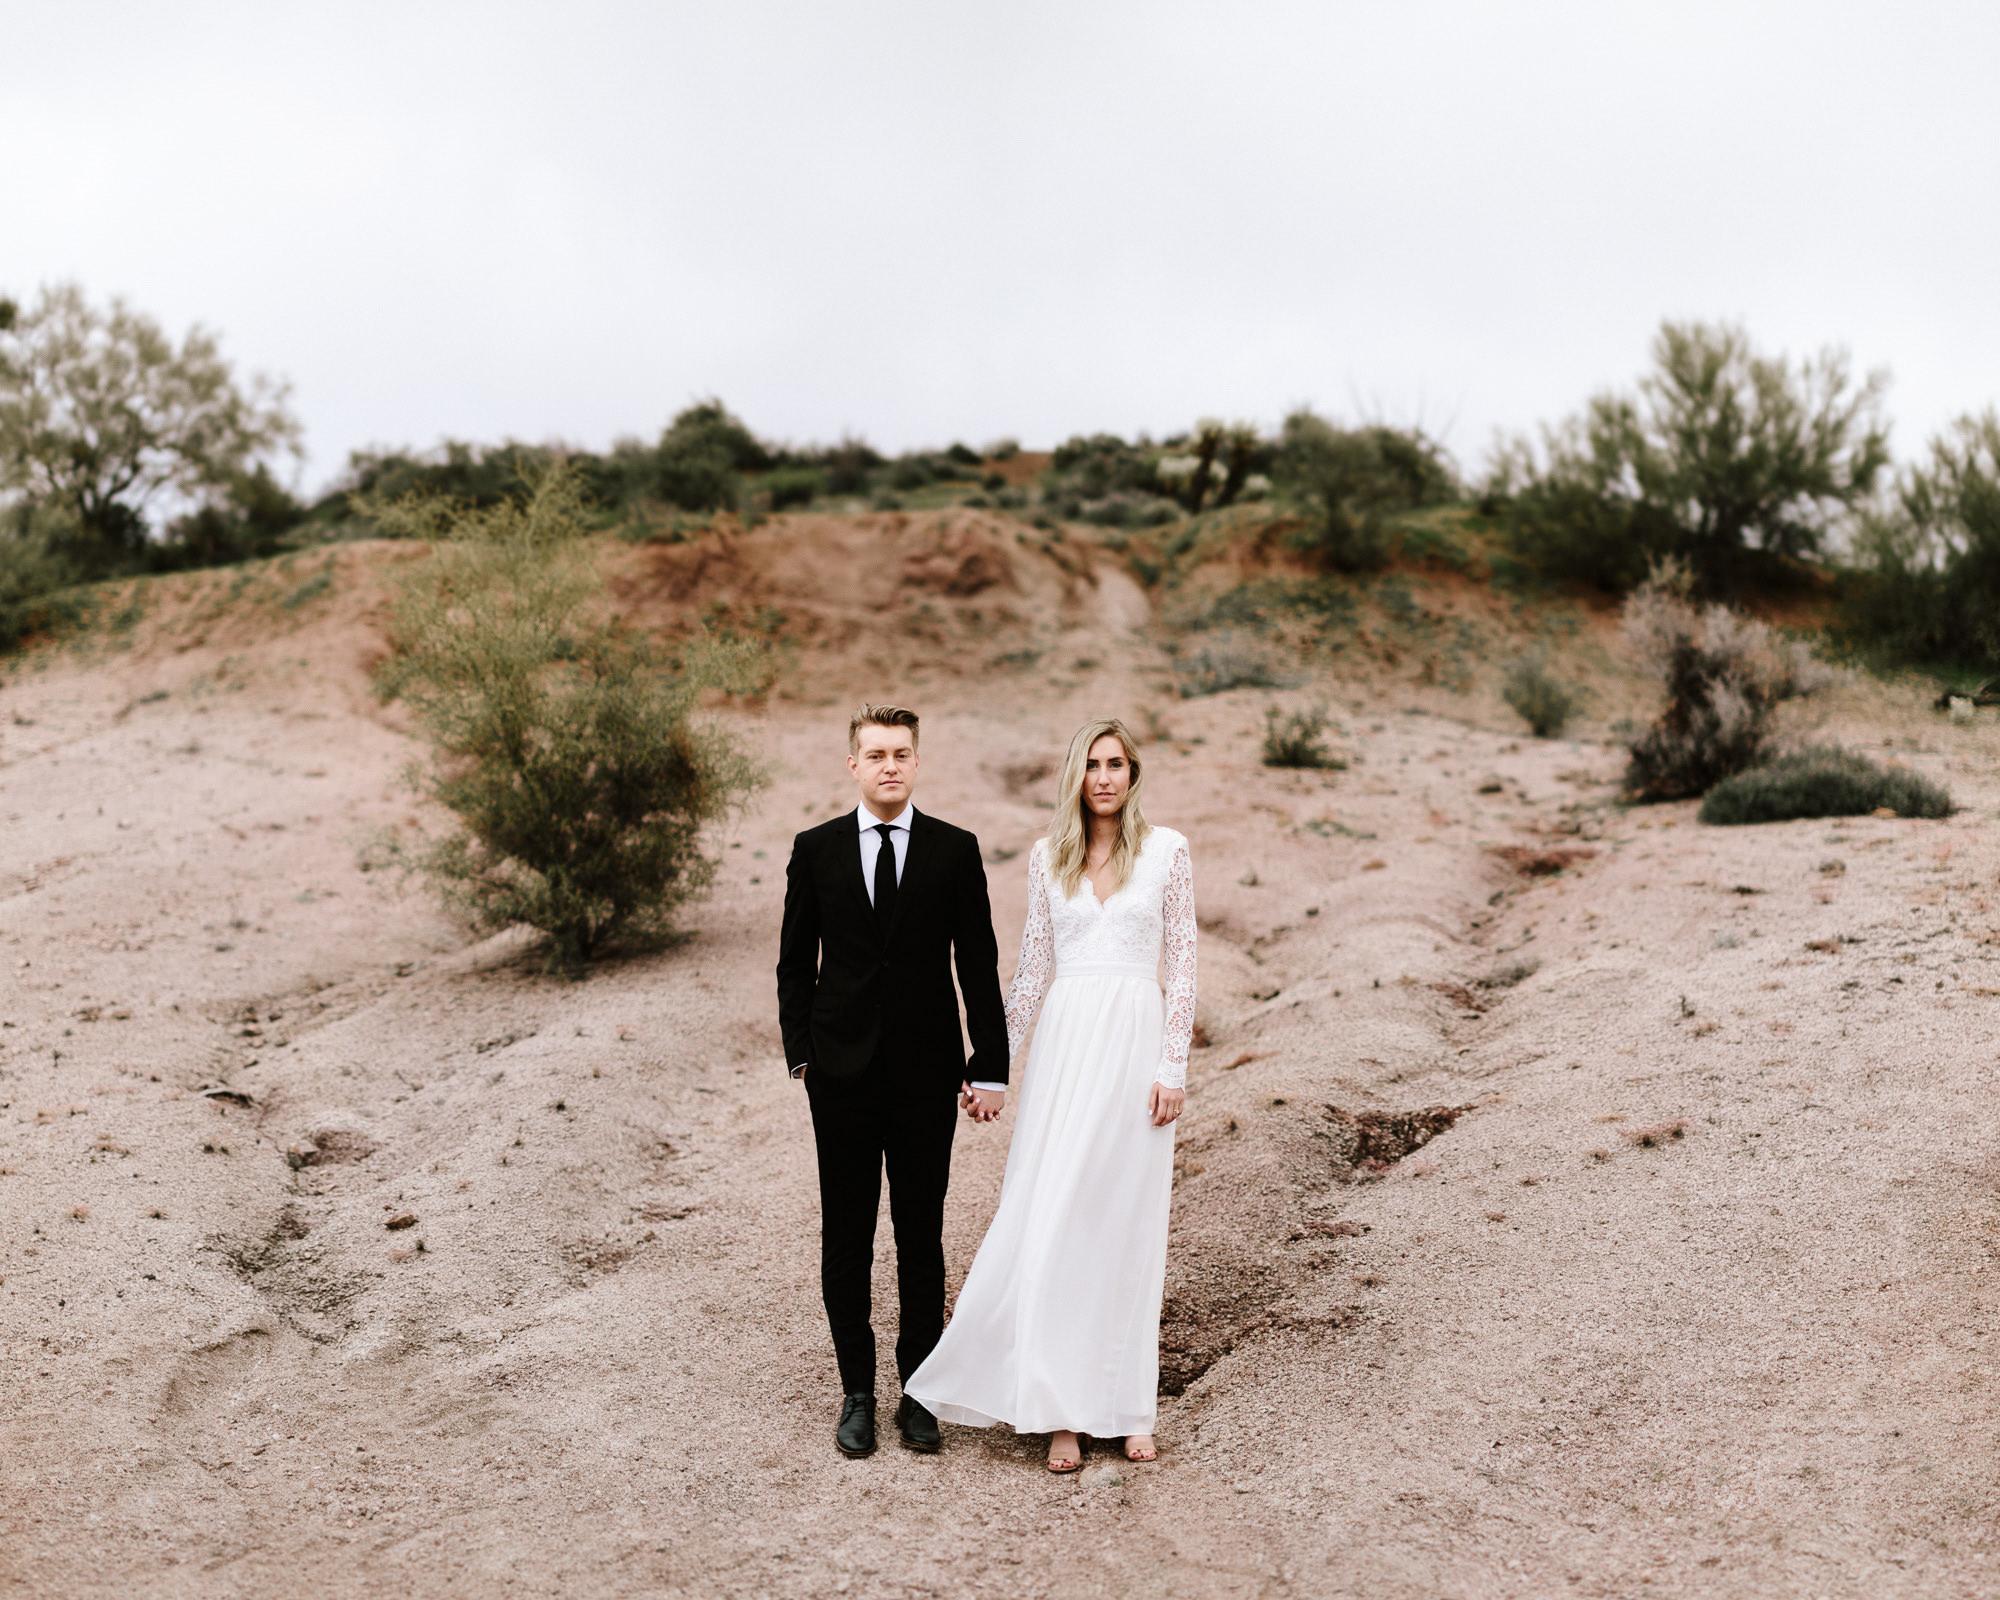 phoenix-mesa-elopement-wedding-photographer-lost-dutchman-state-park-superstitious-mountains-01.jpg